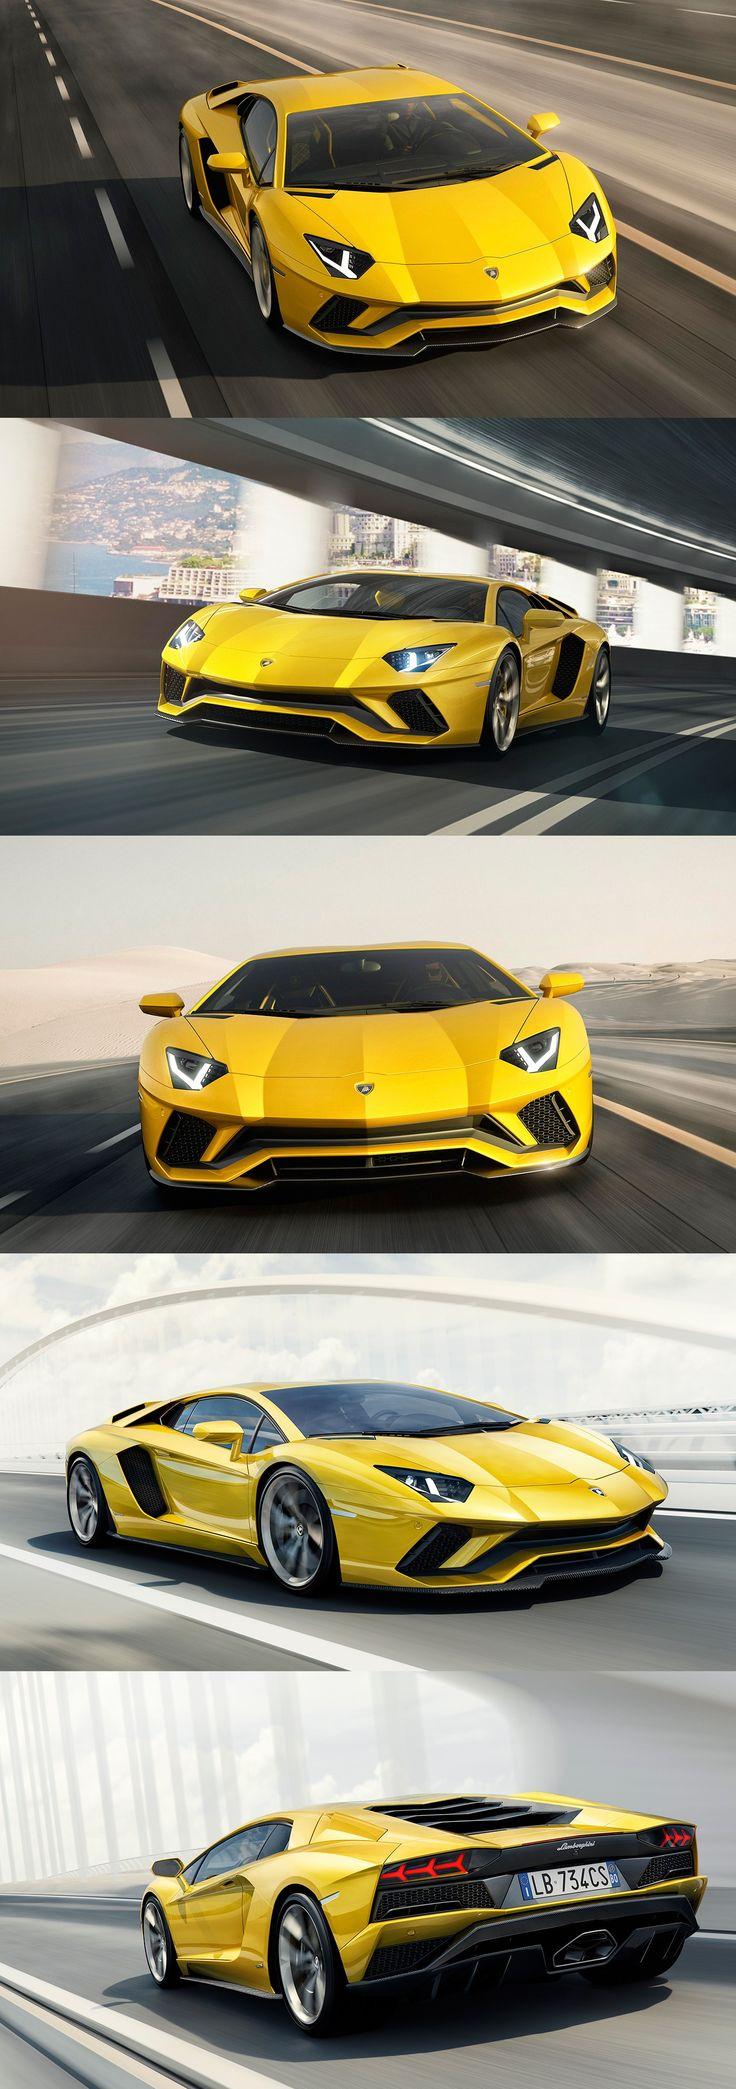 Lamborghini India to Bring Aventador S on March 3